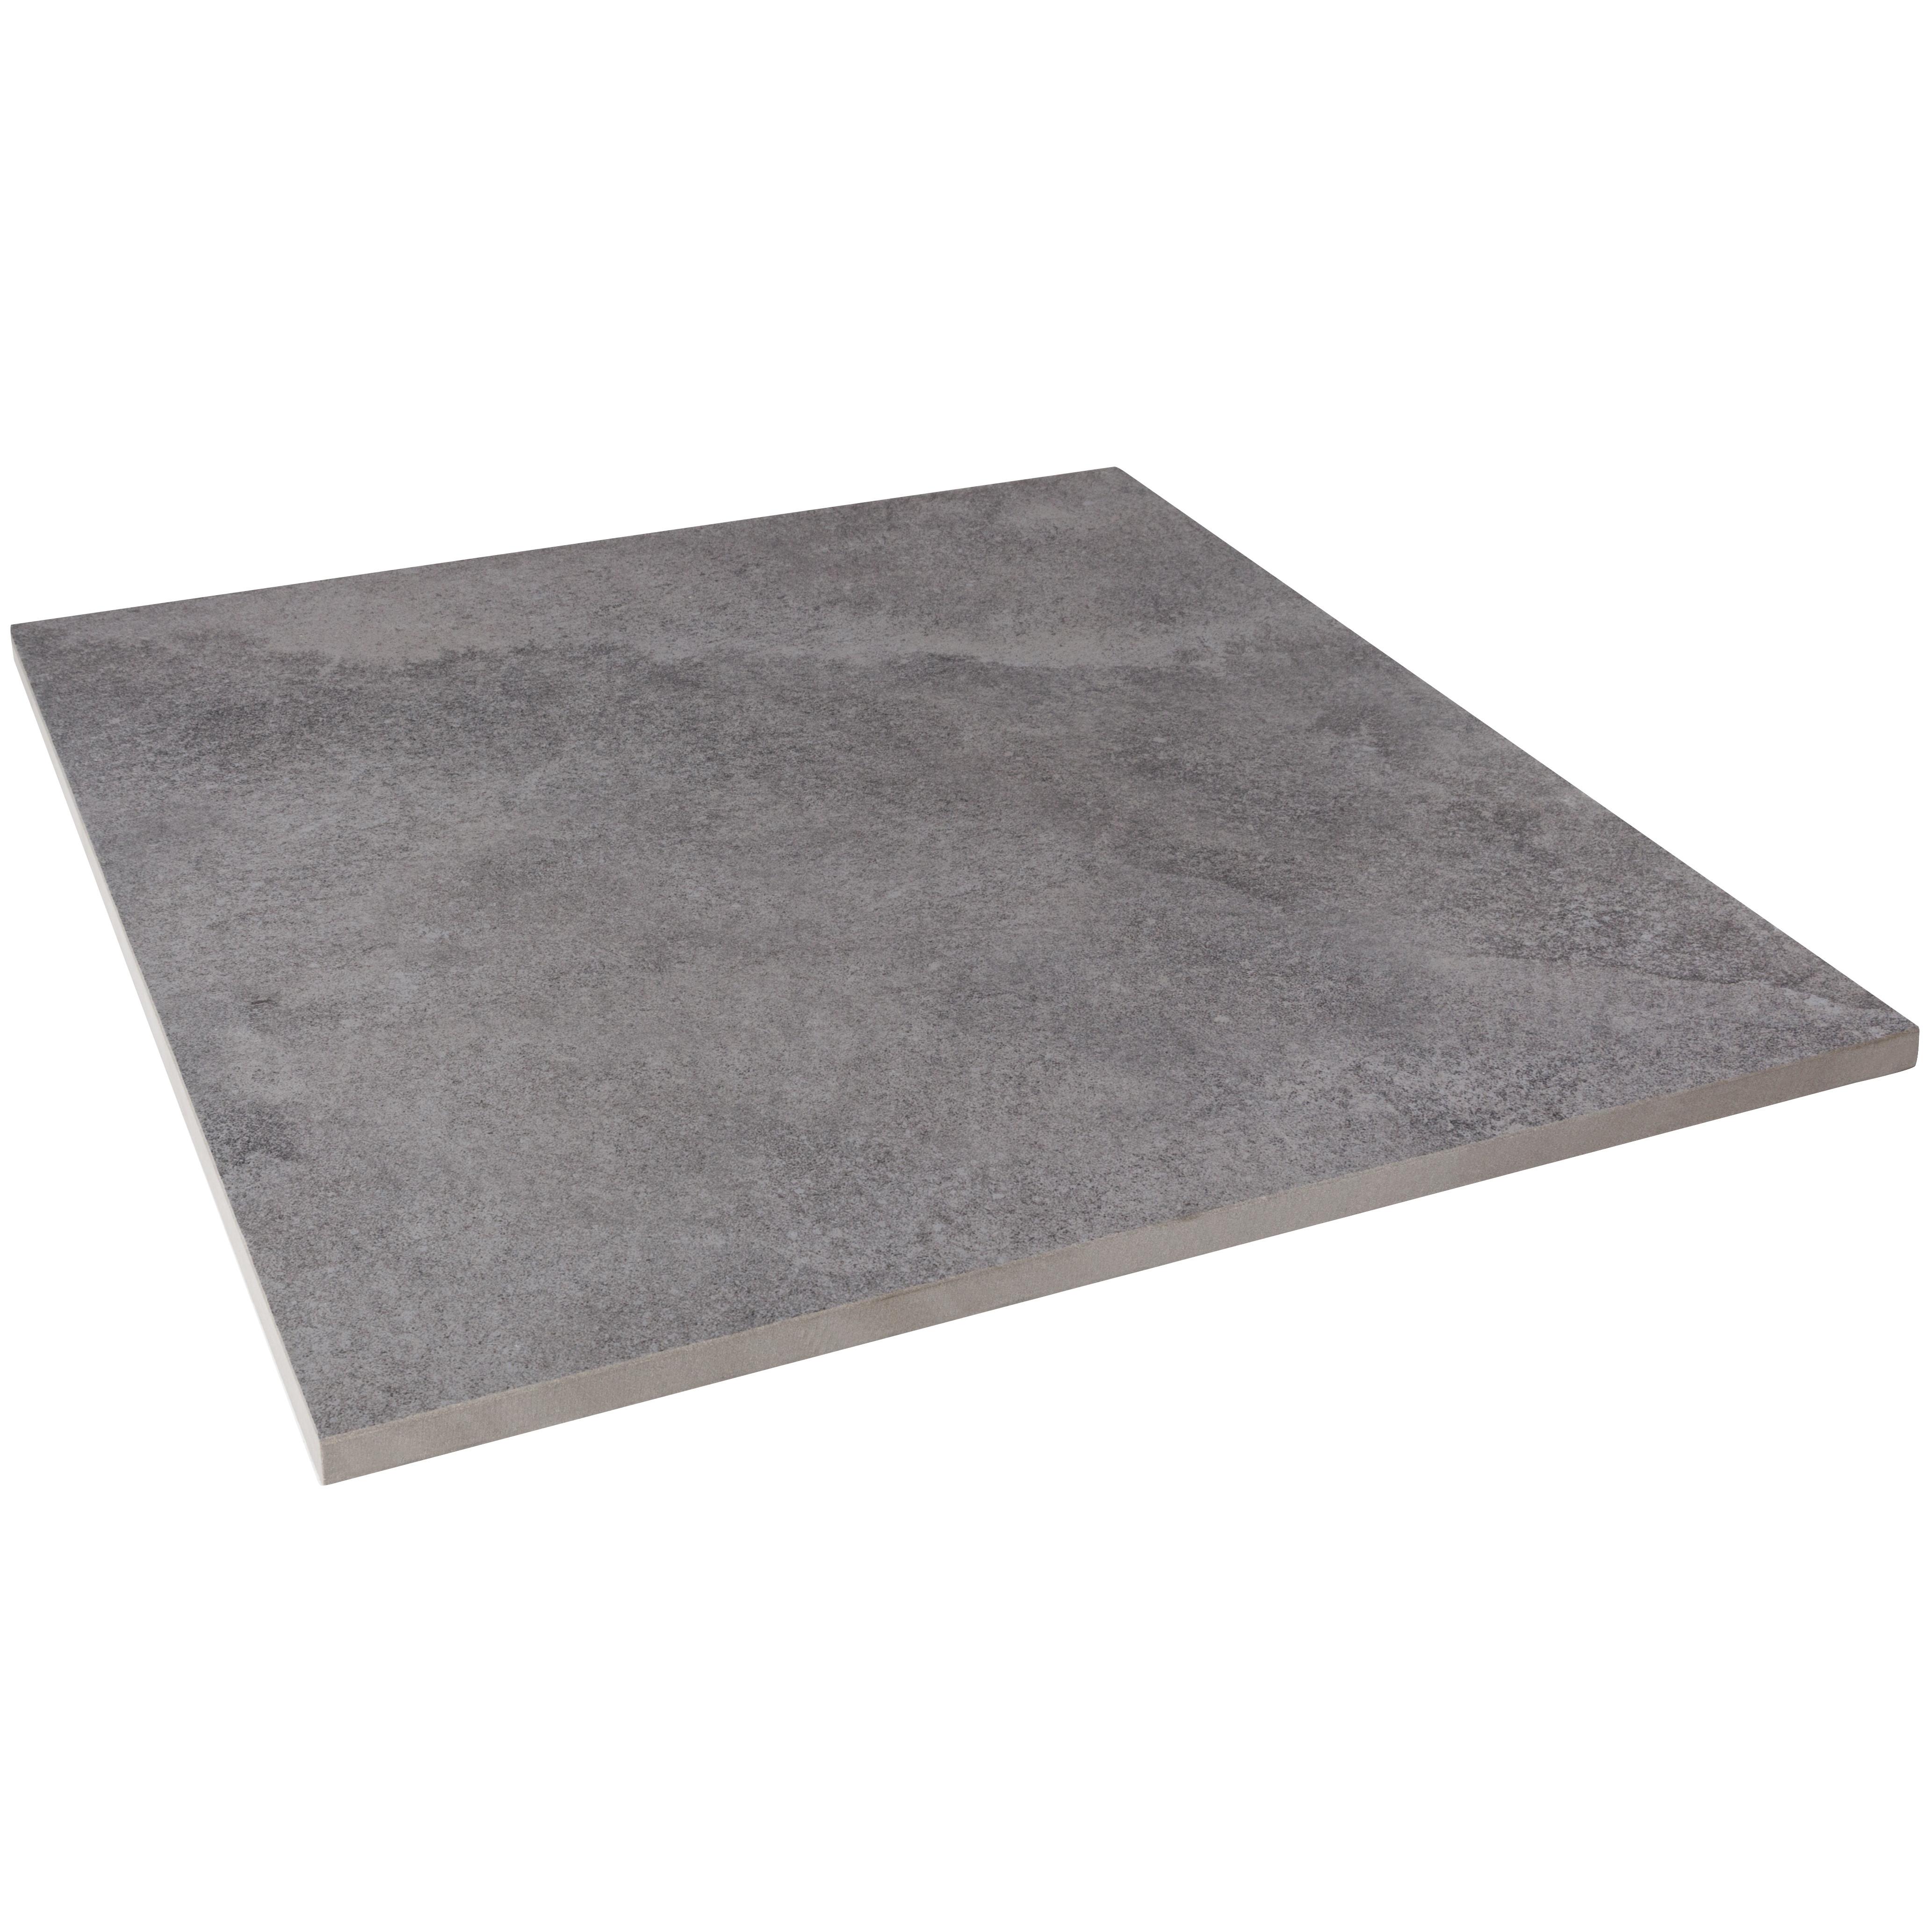 Terrassenplatten Sonderposten Rocky Outdoor grey 200x200x20cm ...